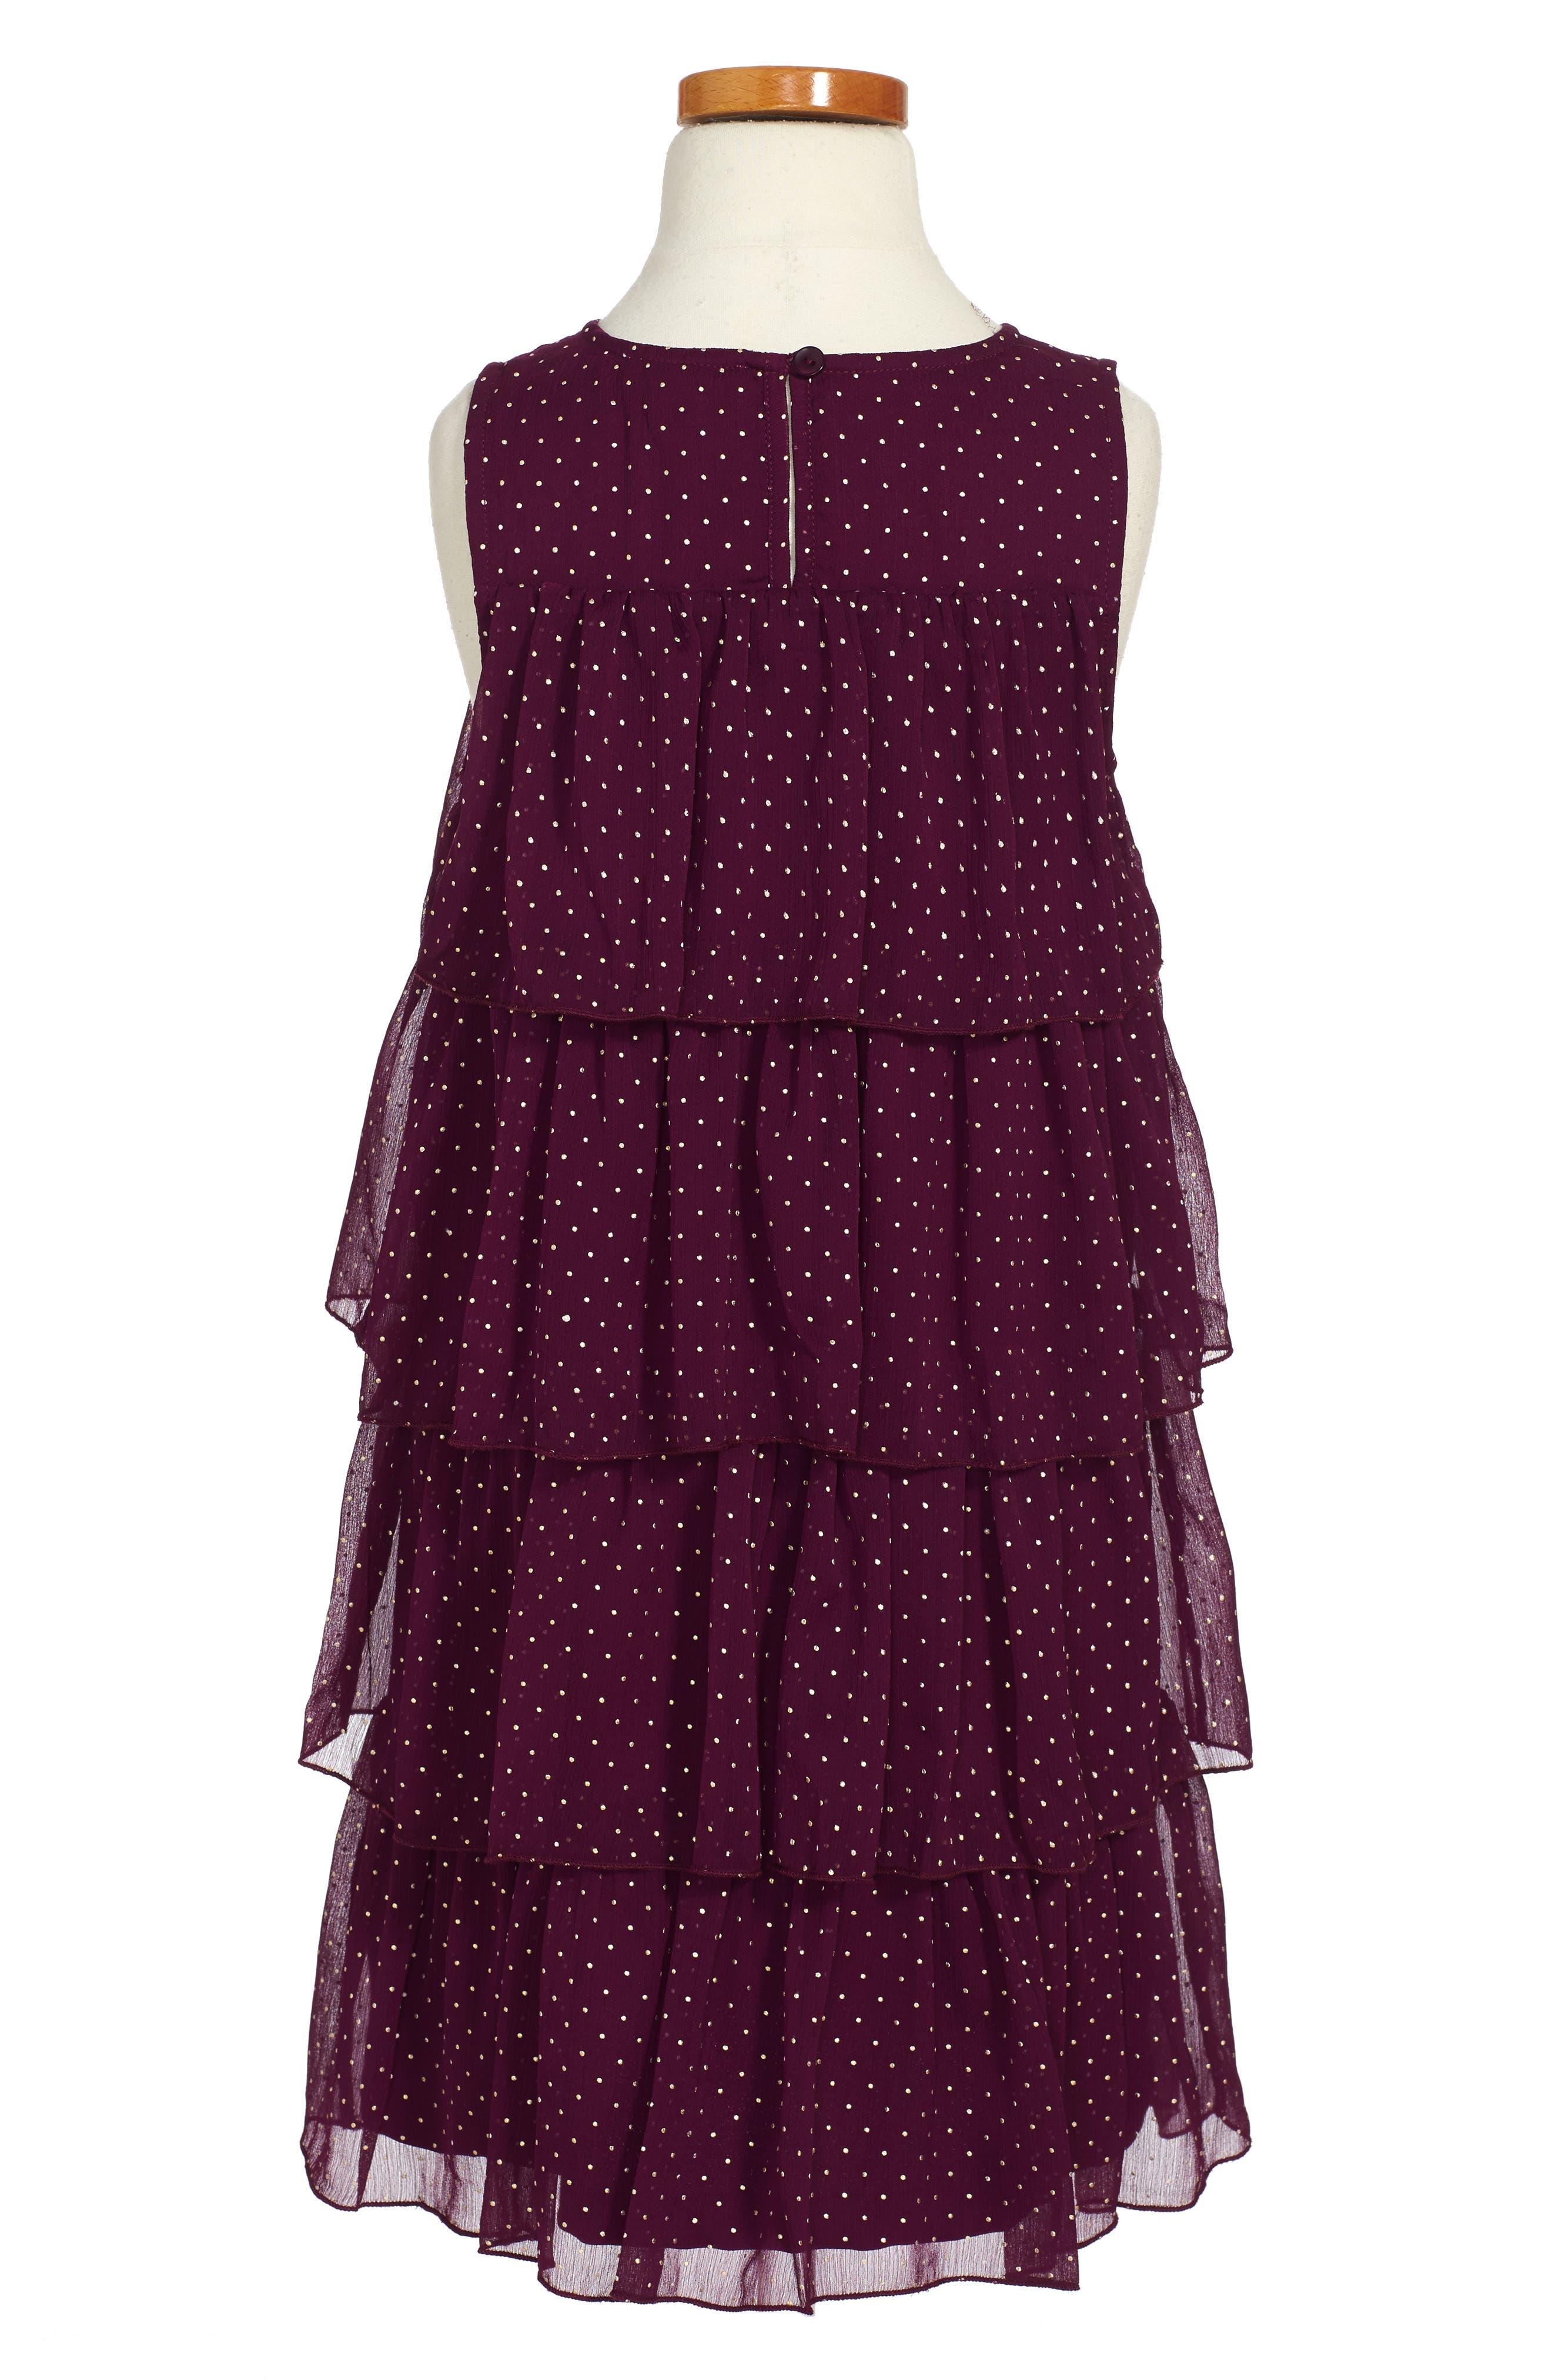 Alternate Image 2  - Ruby & Bloom Tiered Dot Dress (Toddler Girls, Little Girls & Big Girls)